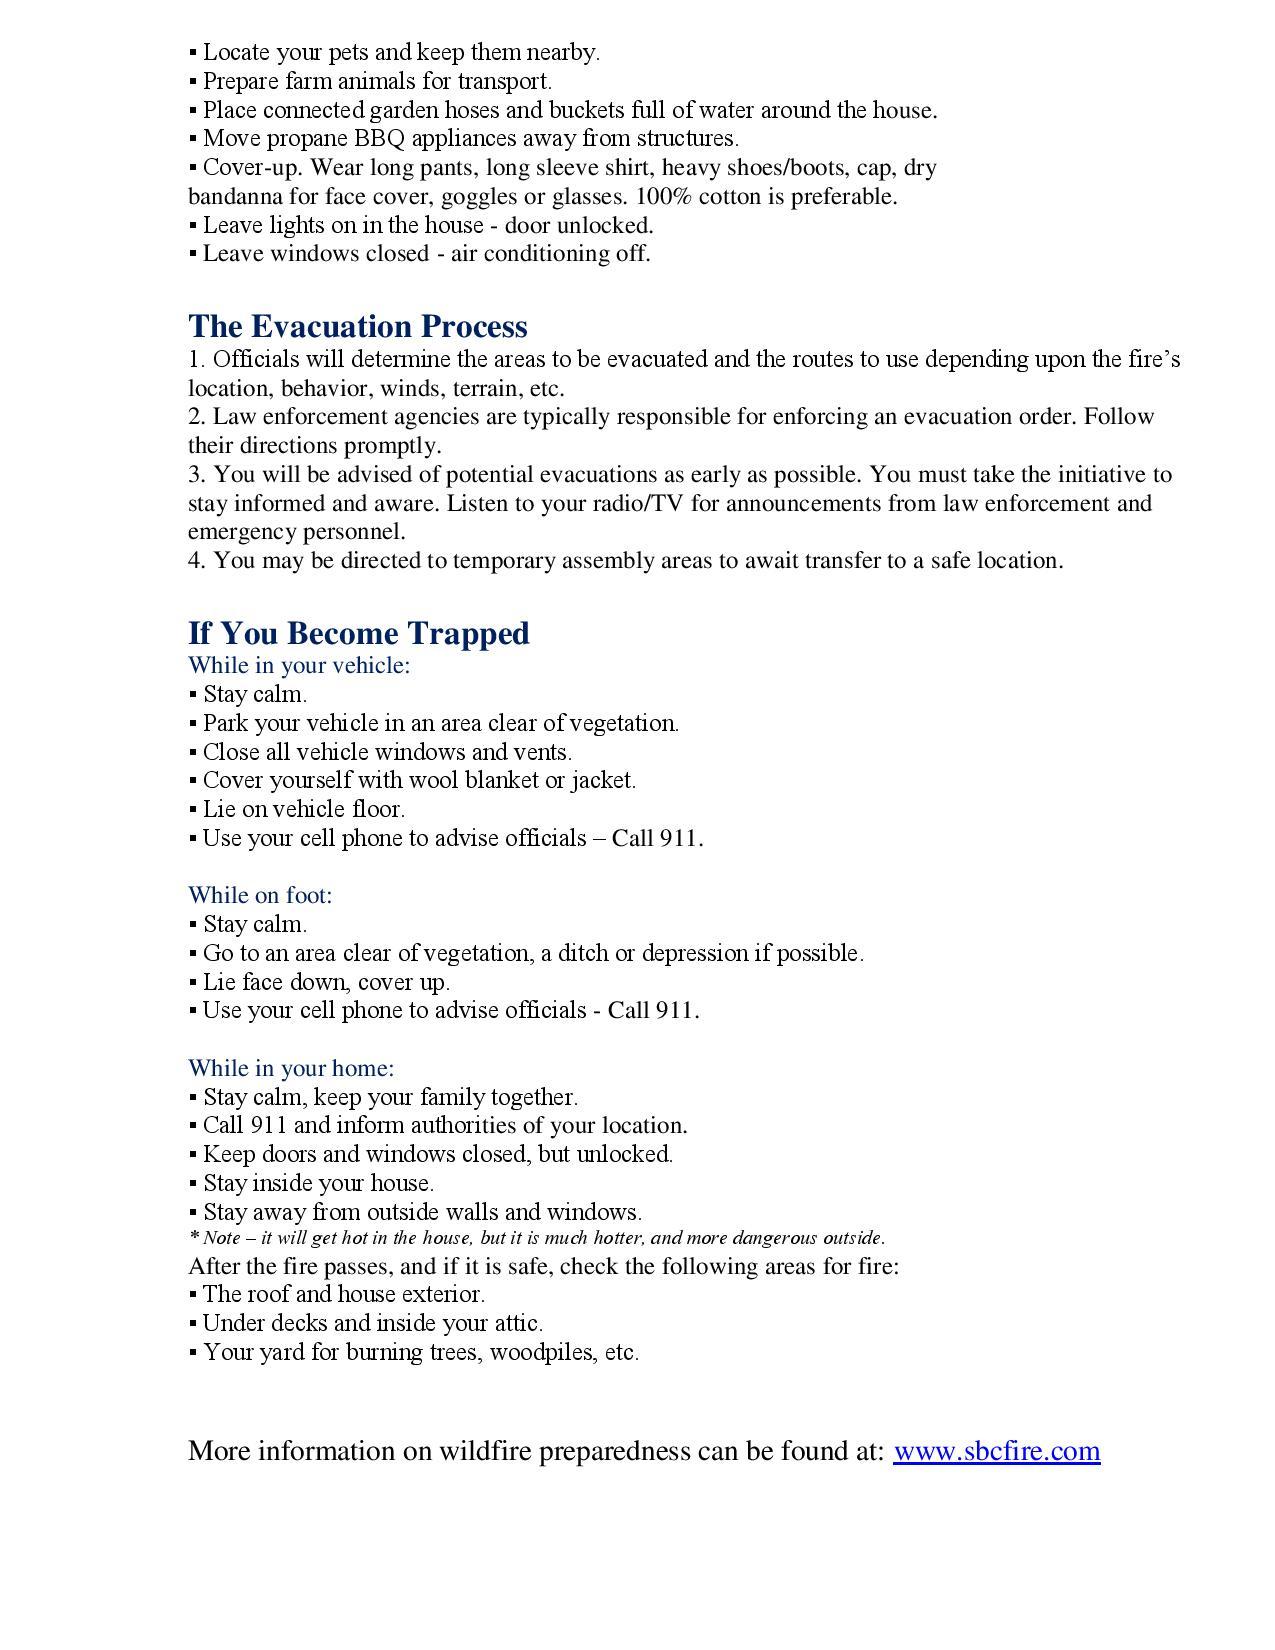 Evacuation Tips-pg2